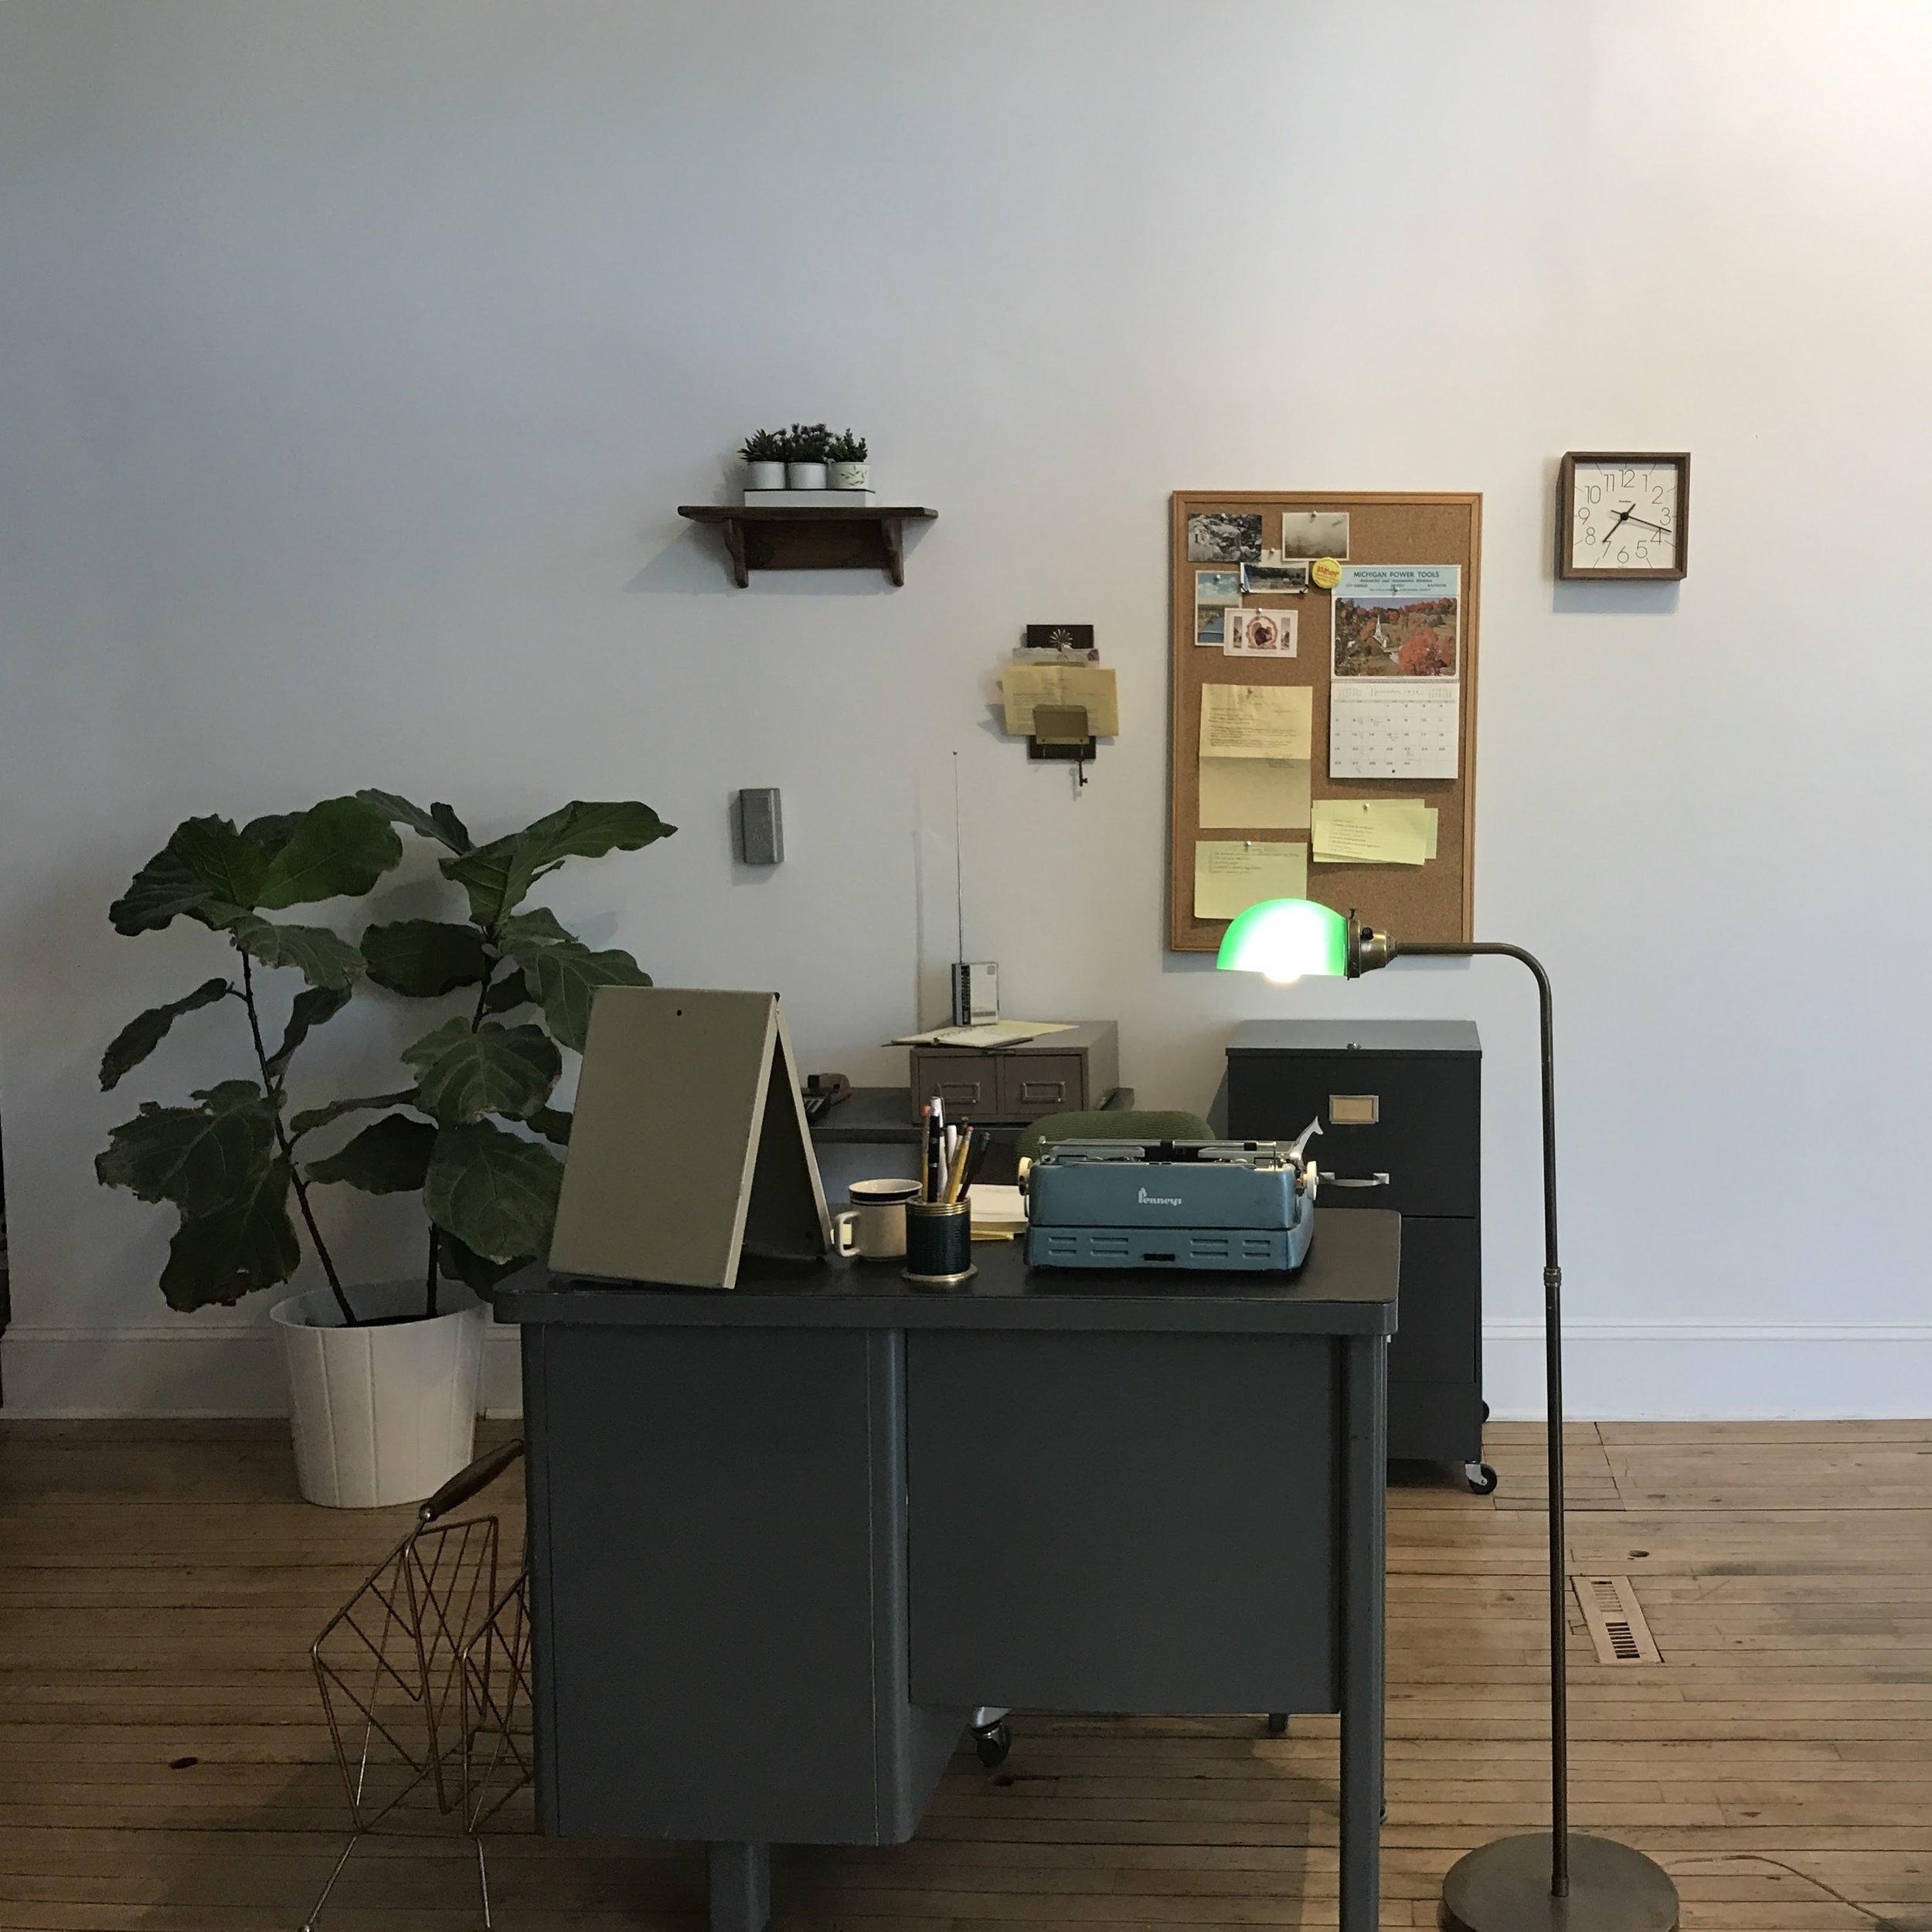 Corrty Pye Municipal Office #4 , Modus Locus, Minneapolis, 2017